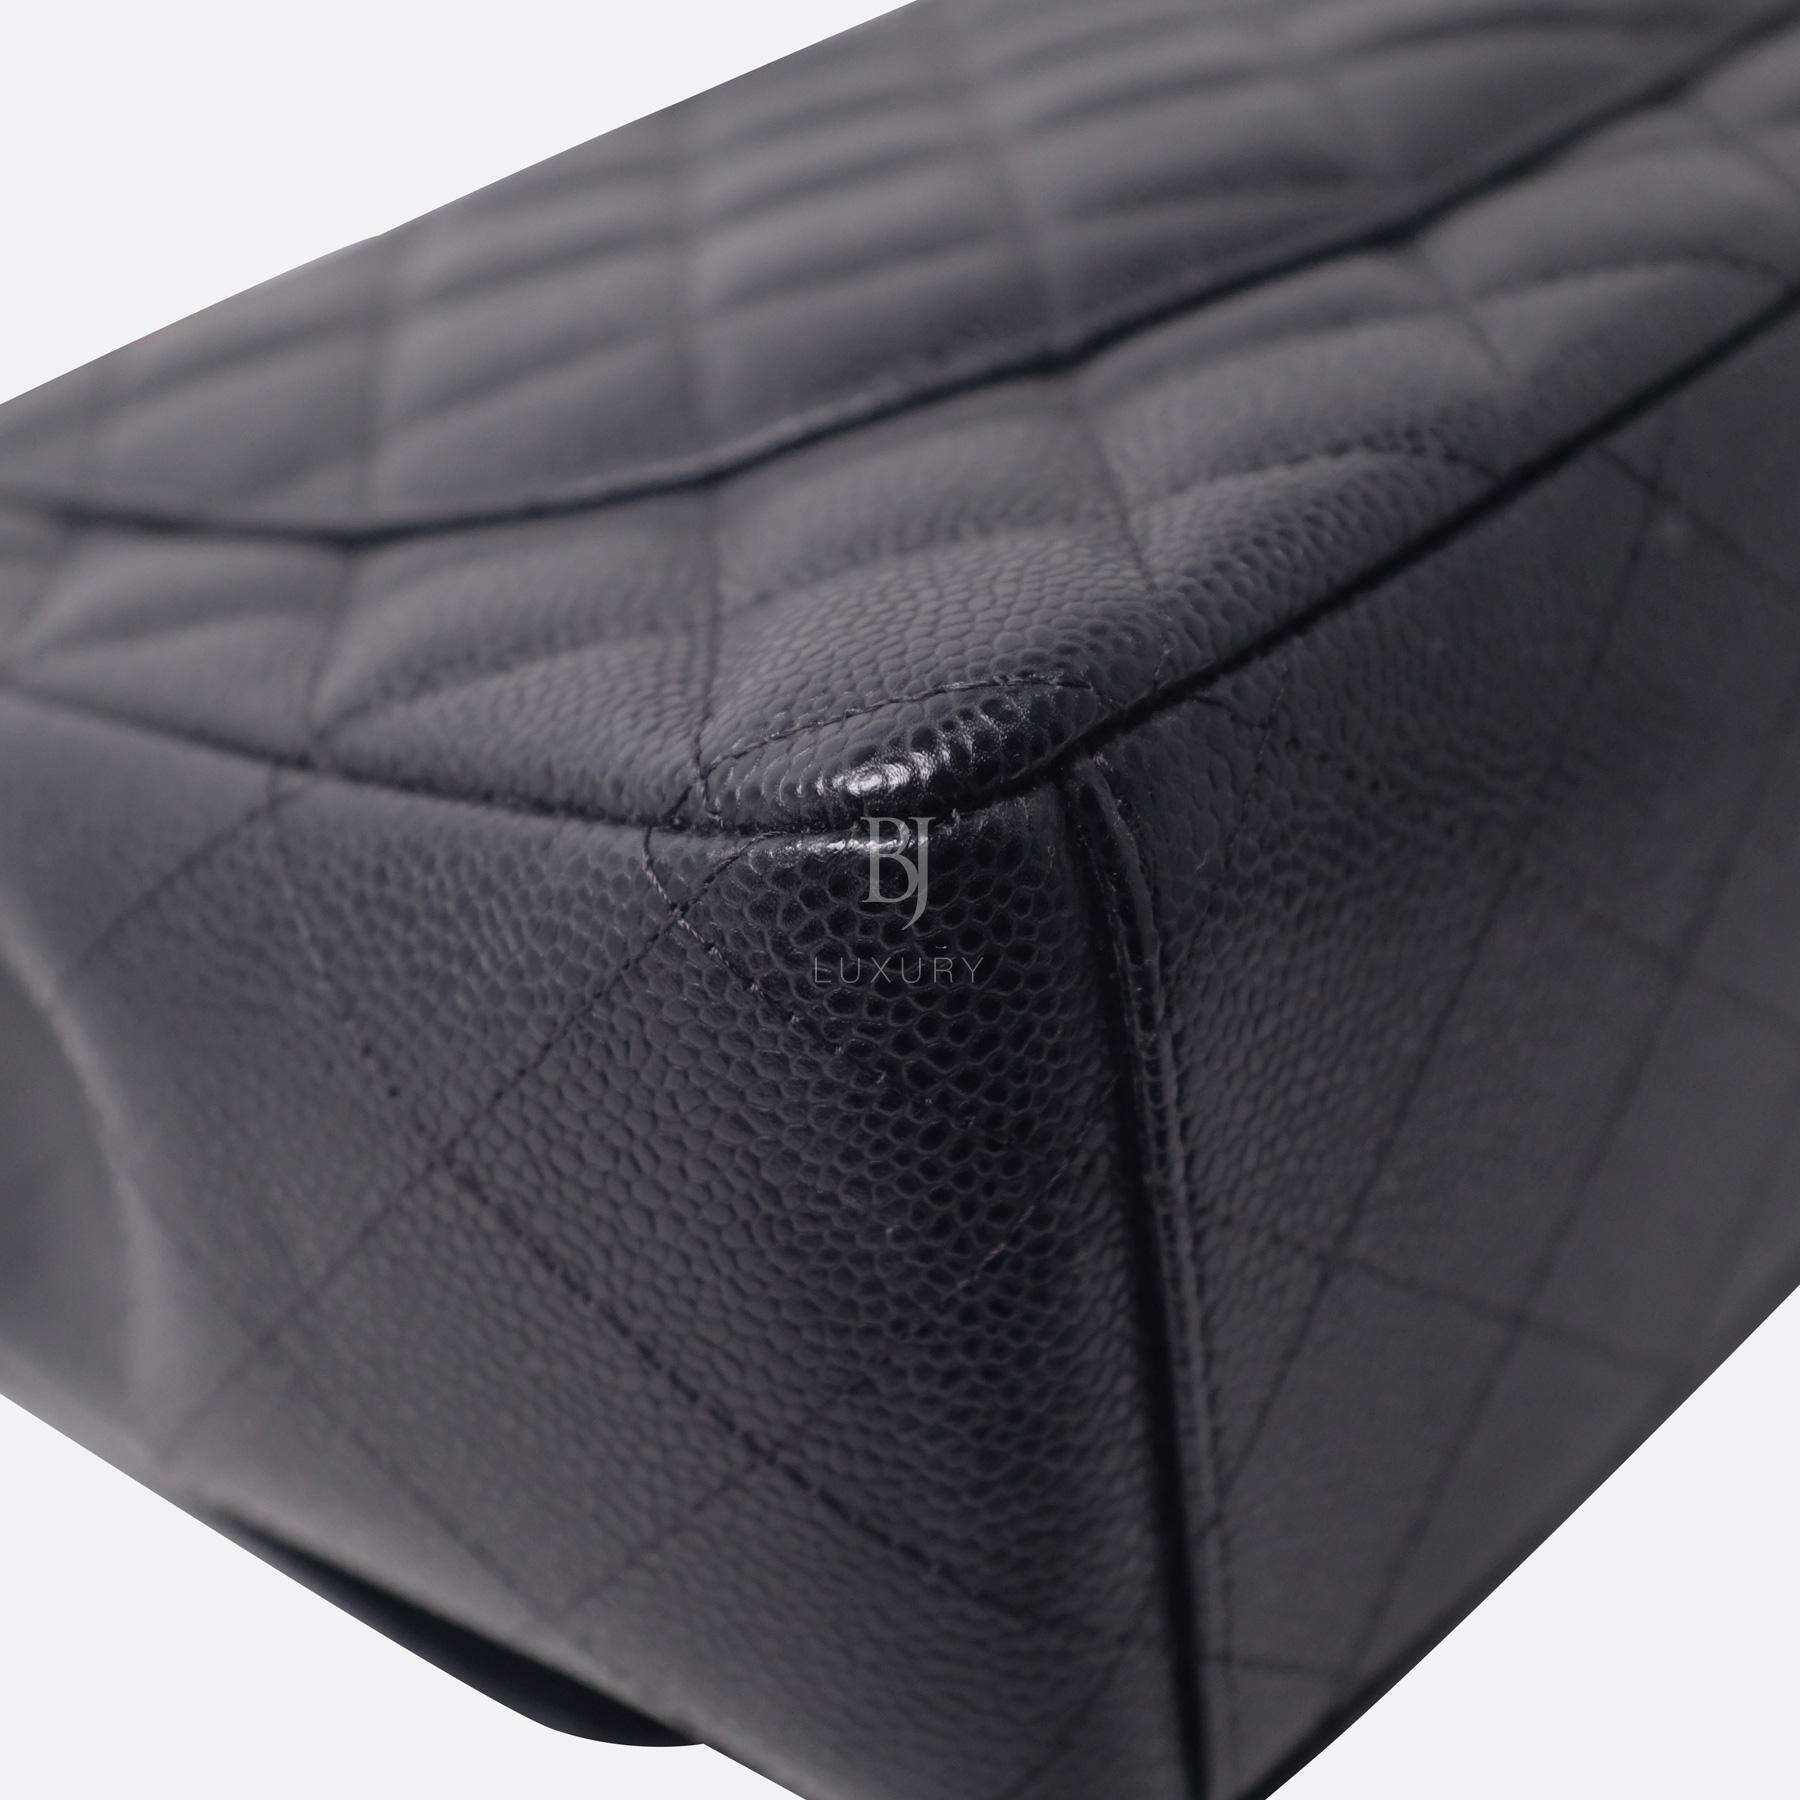 Chanel Classic Handbag Caviar Maxi Black BJ Luxury 11.jpg